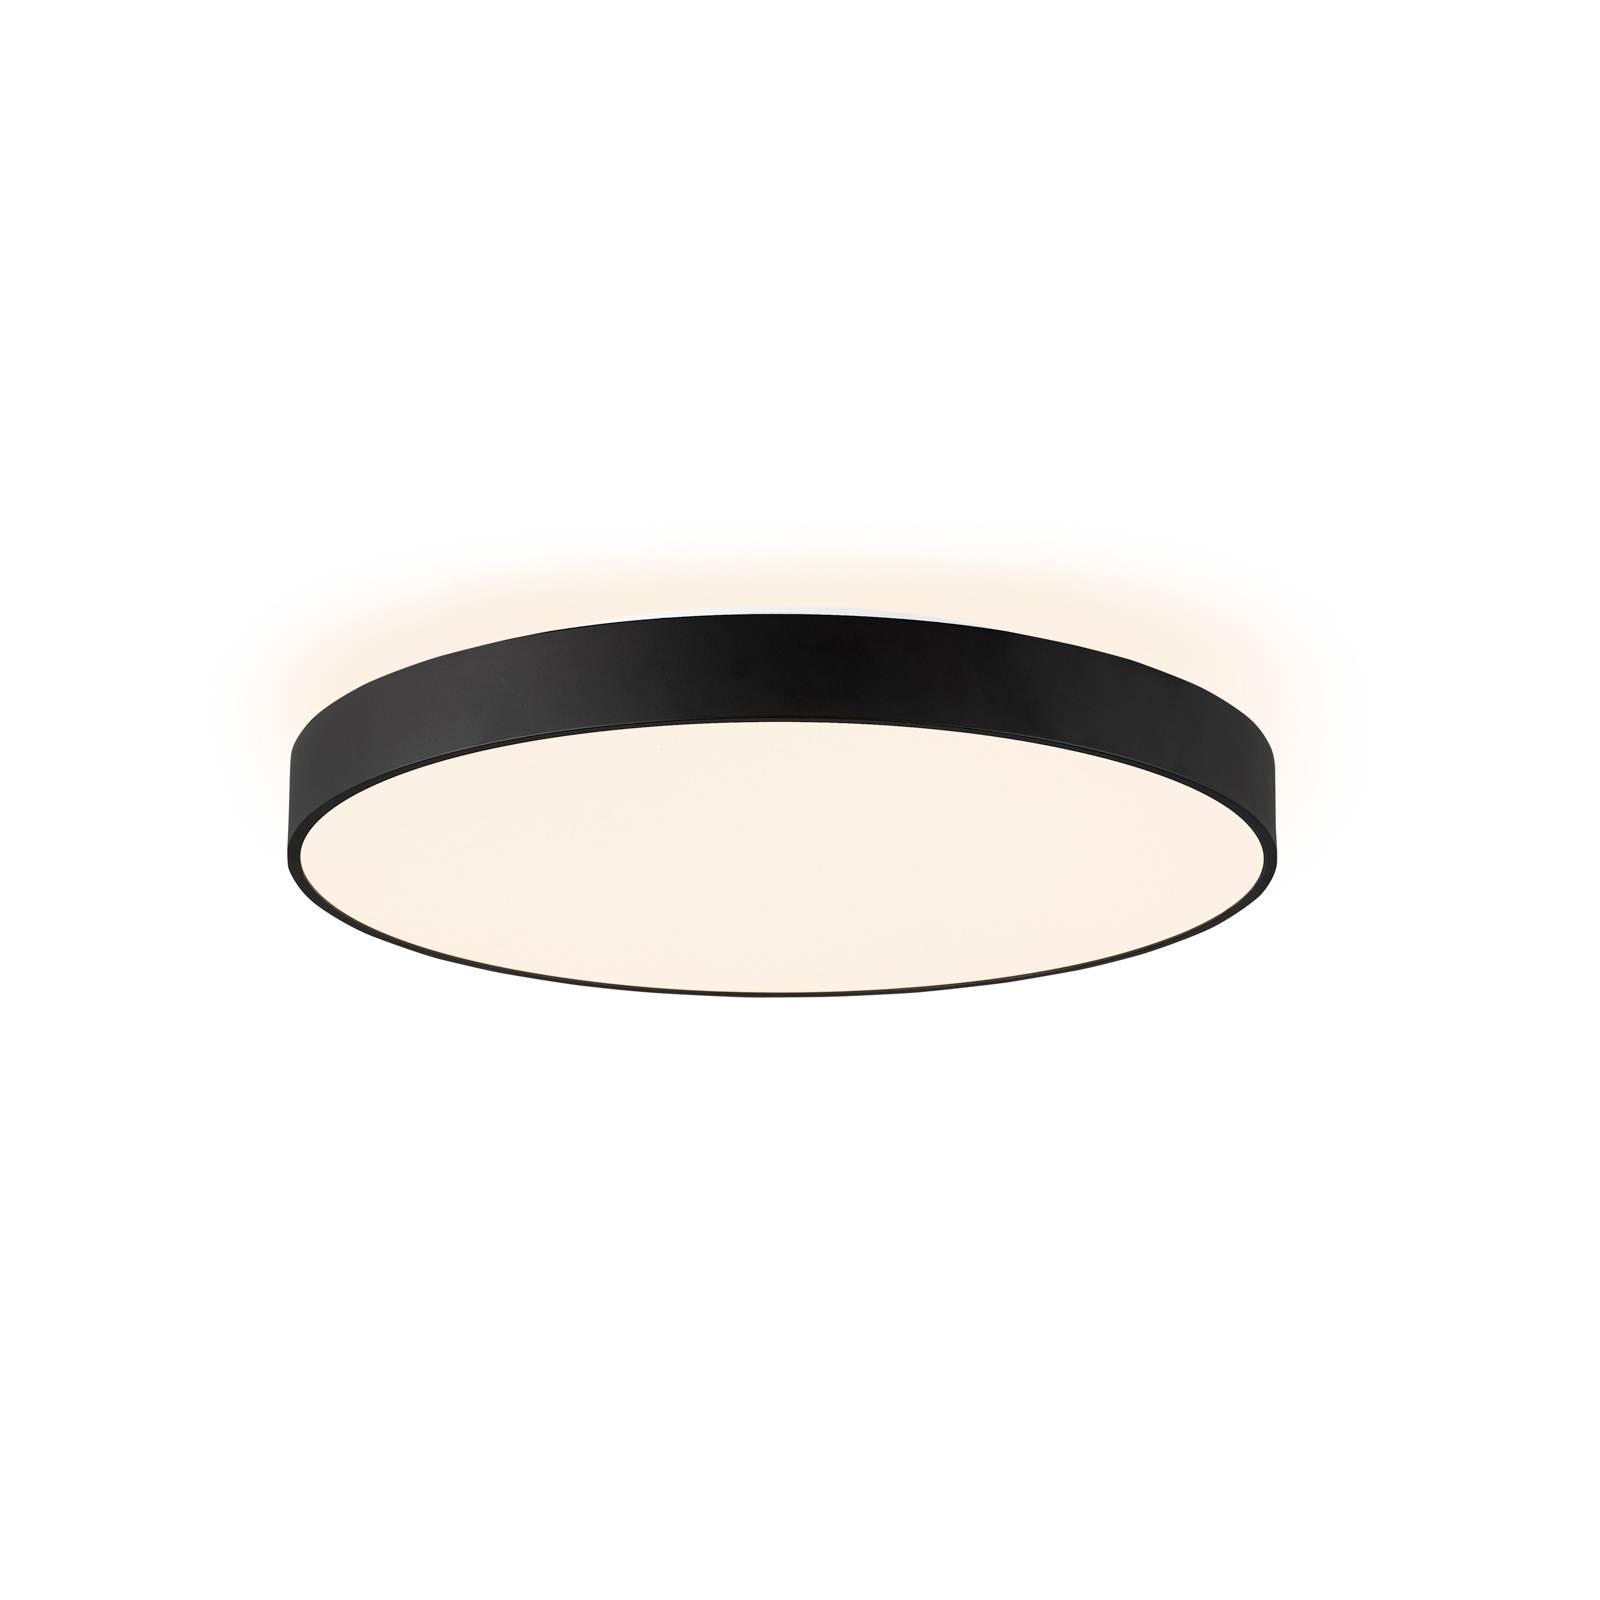 Arcchio Vanida -LED-kattovalaisin musta, 60 cm